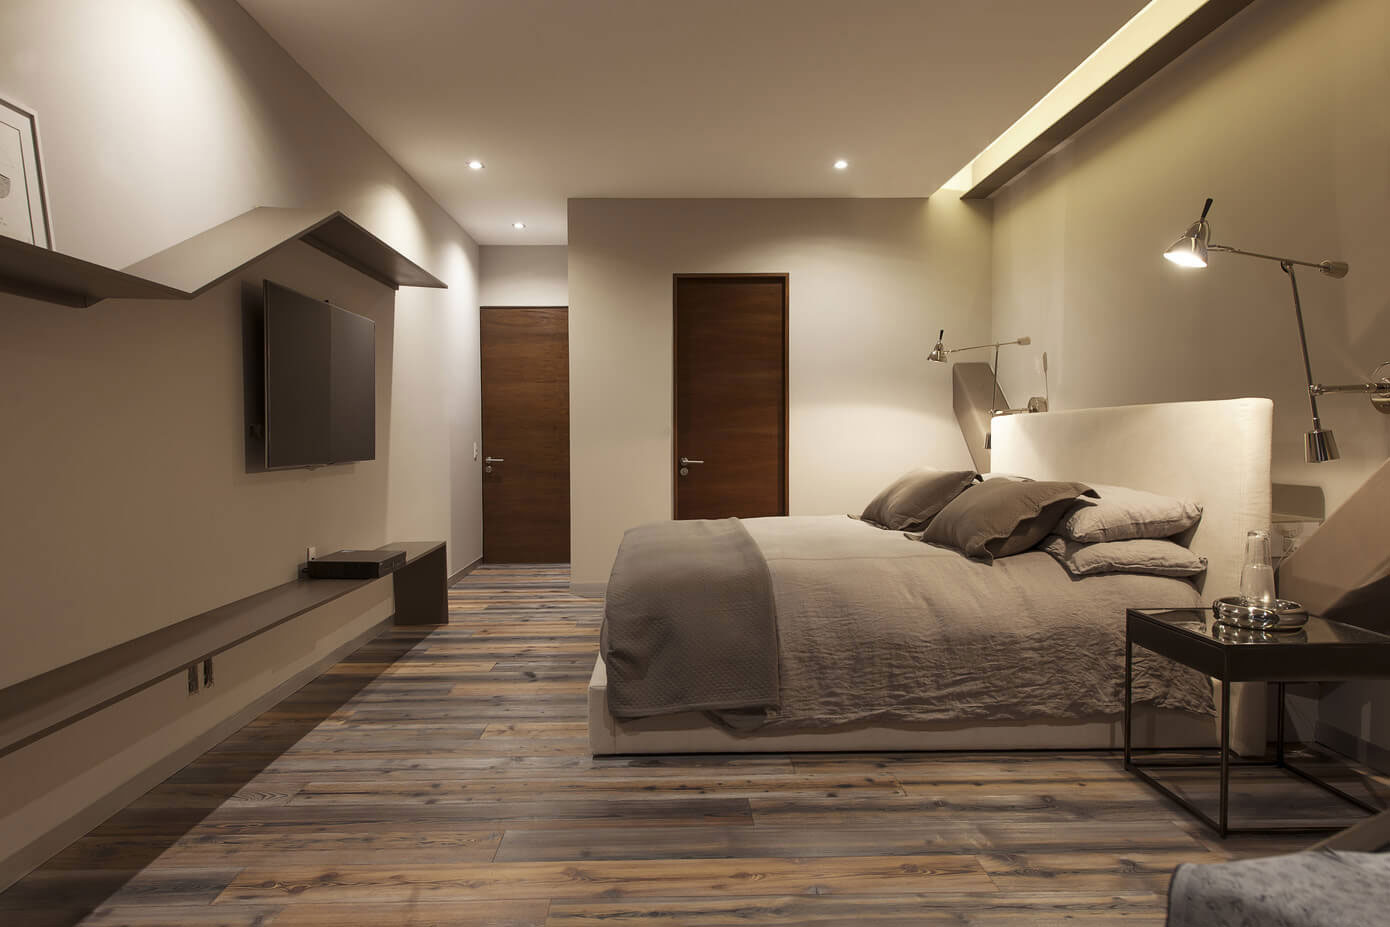 Contemporary CM Apartment in Mexico City by Kababie Arquitectos-09